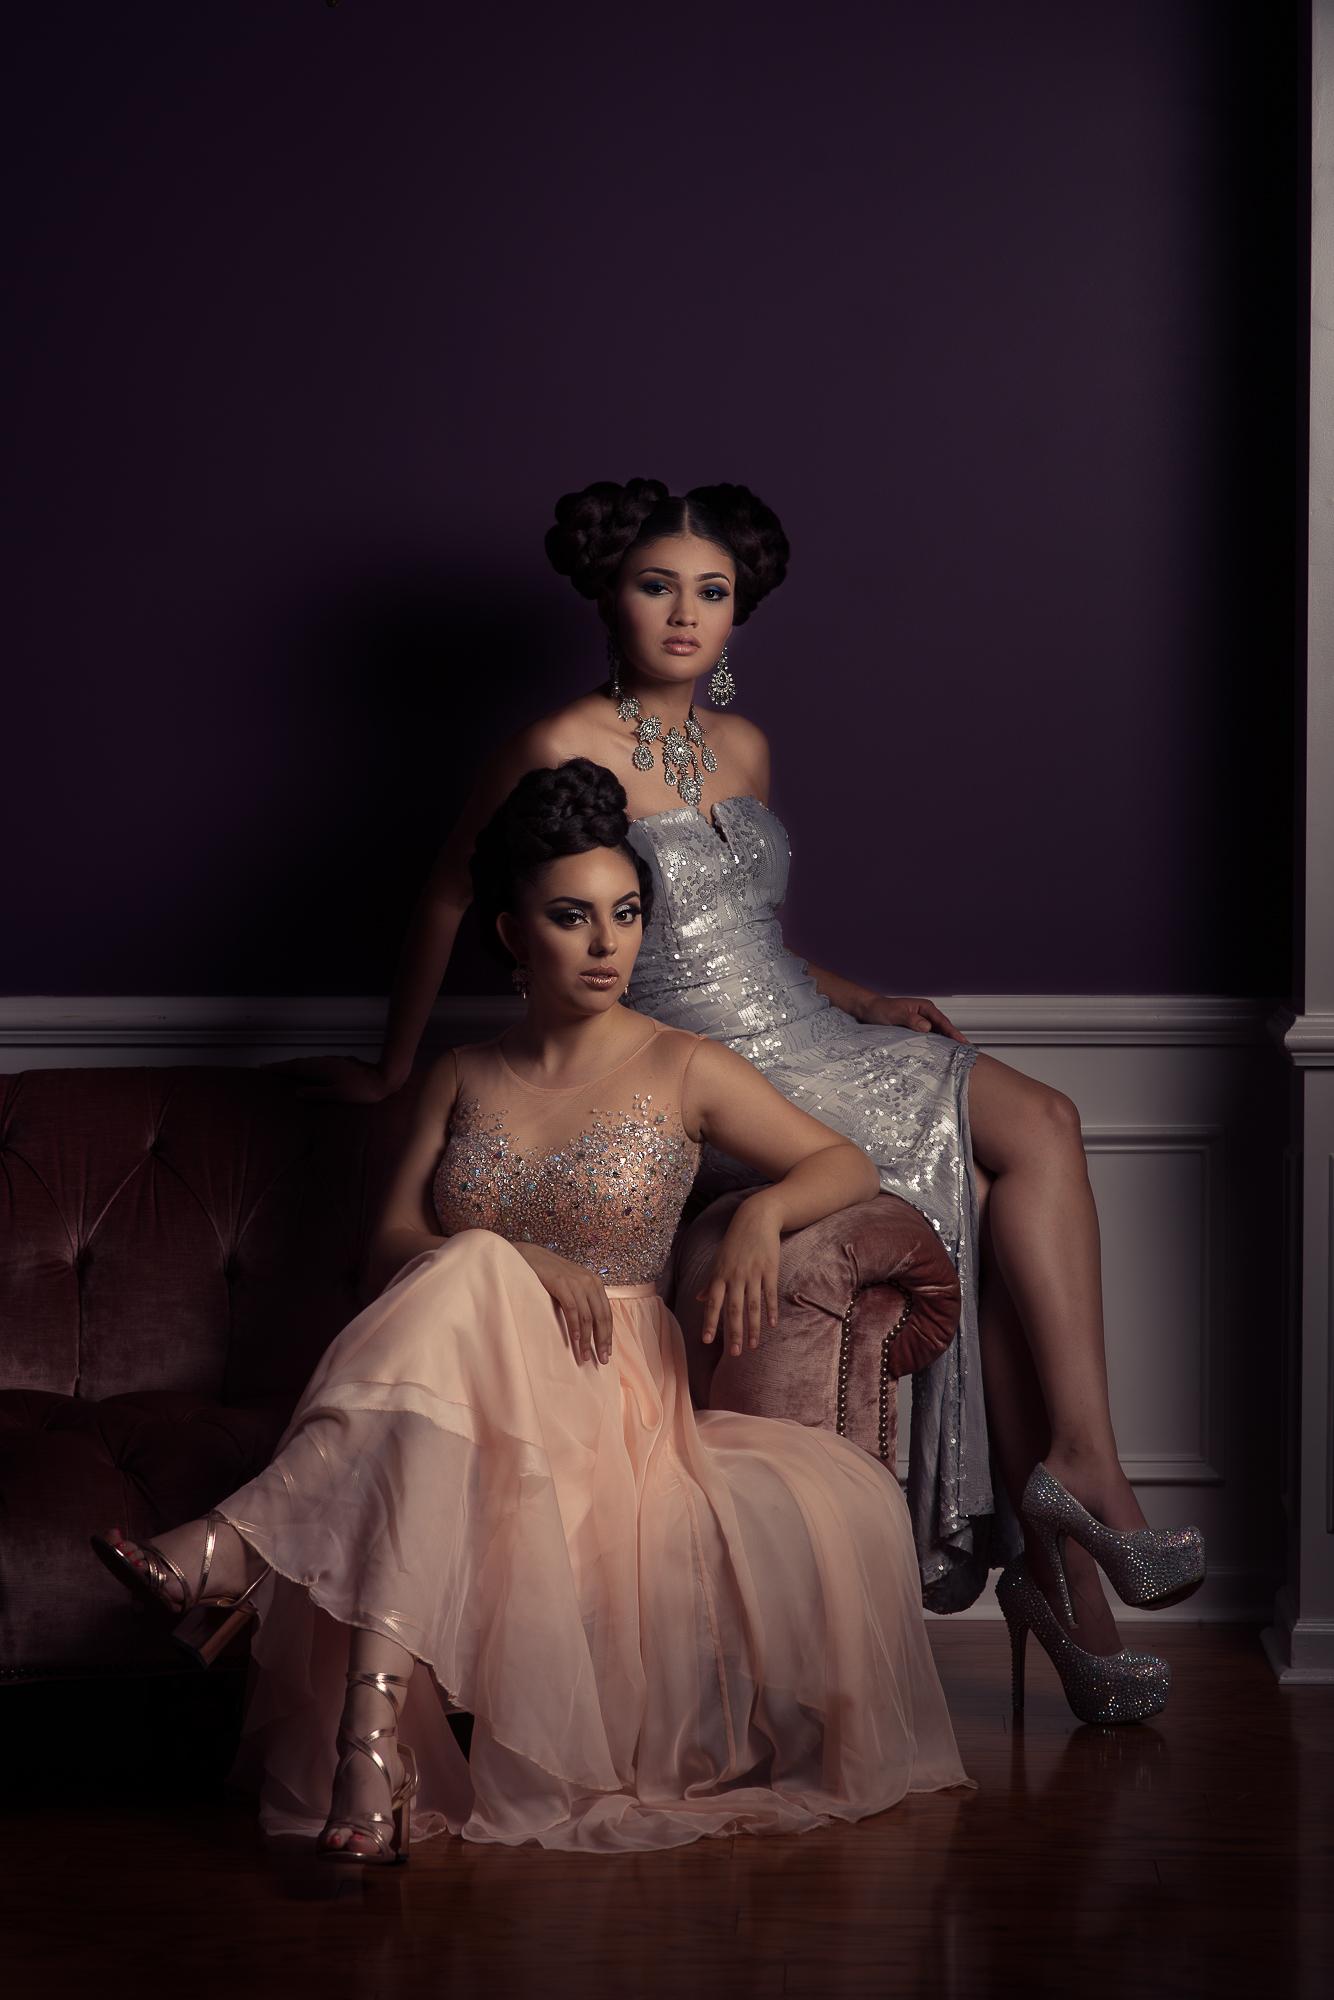 Edge Portraiture - Atlanta Gwinnett Fashion Photography